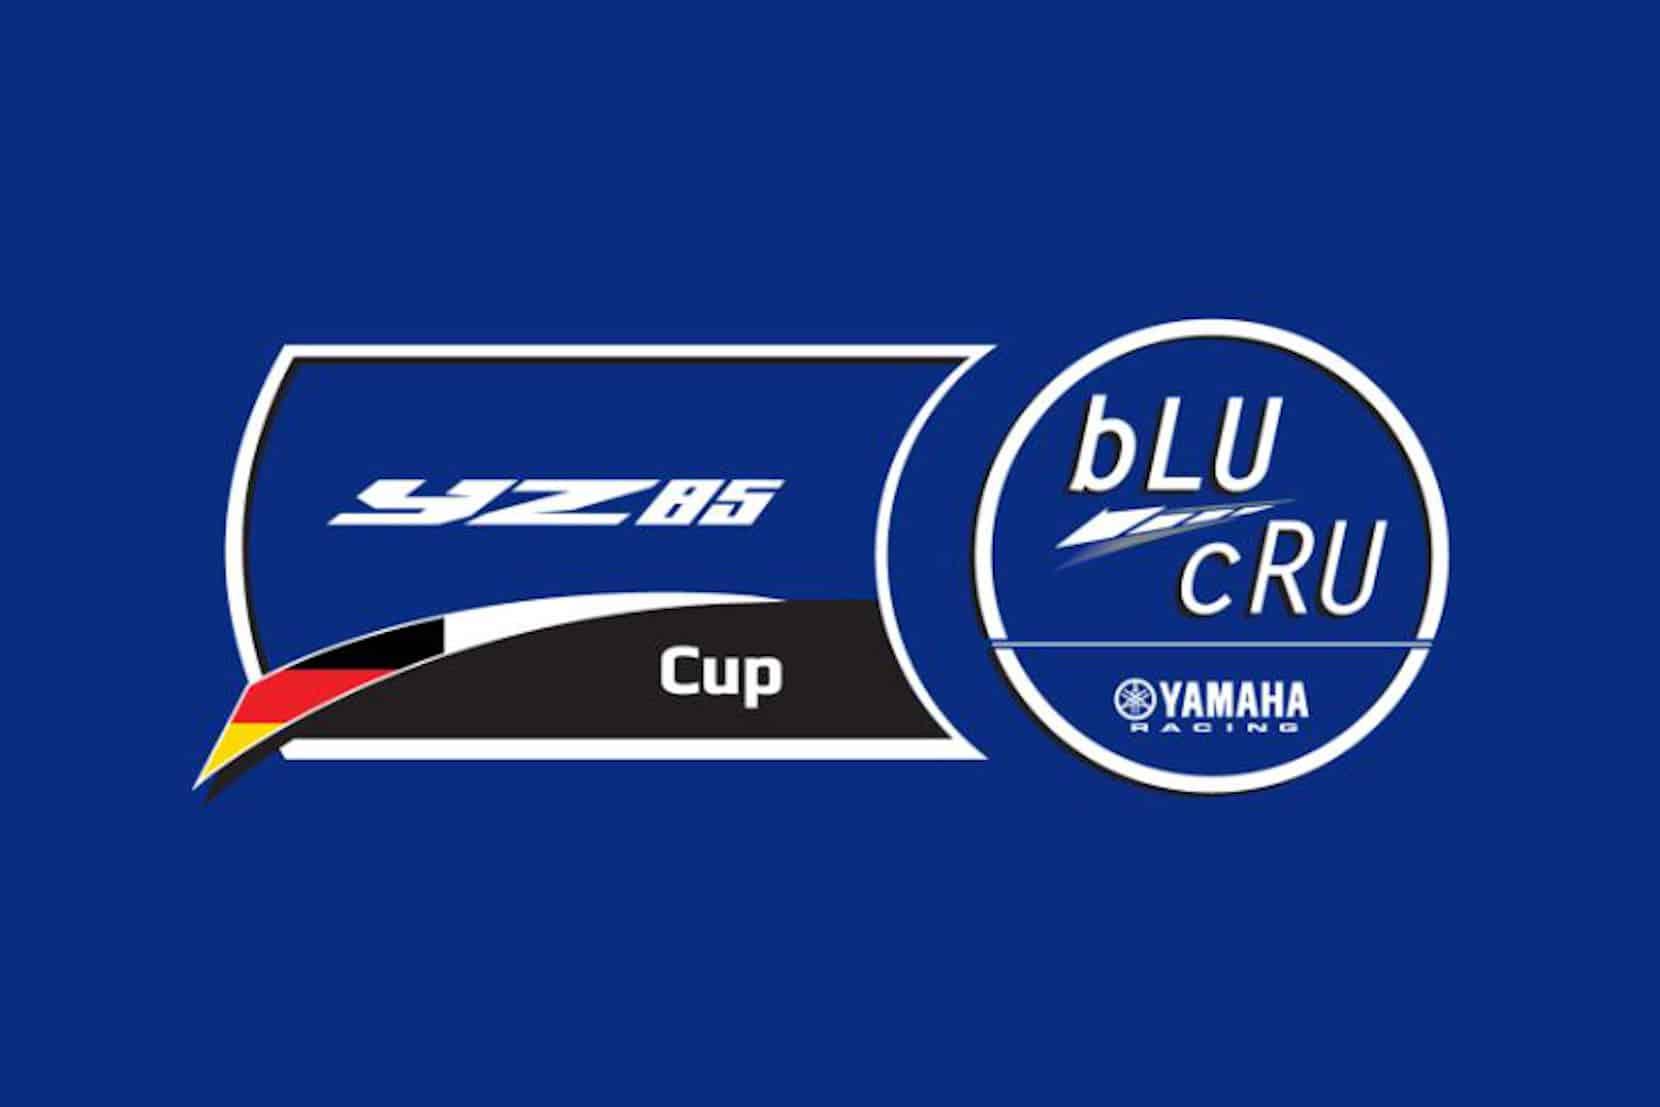 YZ bLU cRU FIM Europe Cup – Ergebnisse Klasse 85ccm Wertungslauf